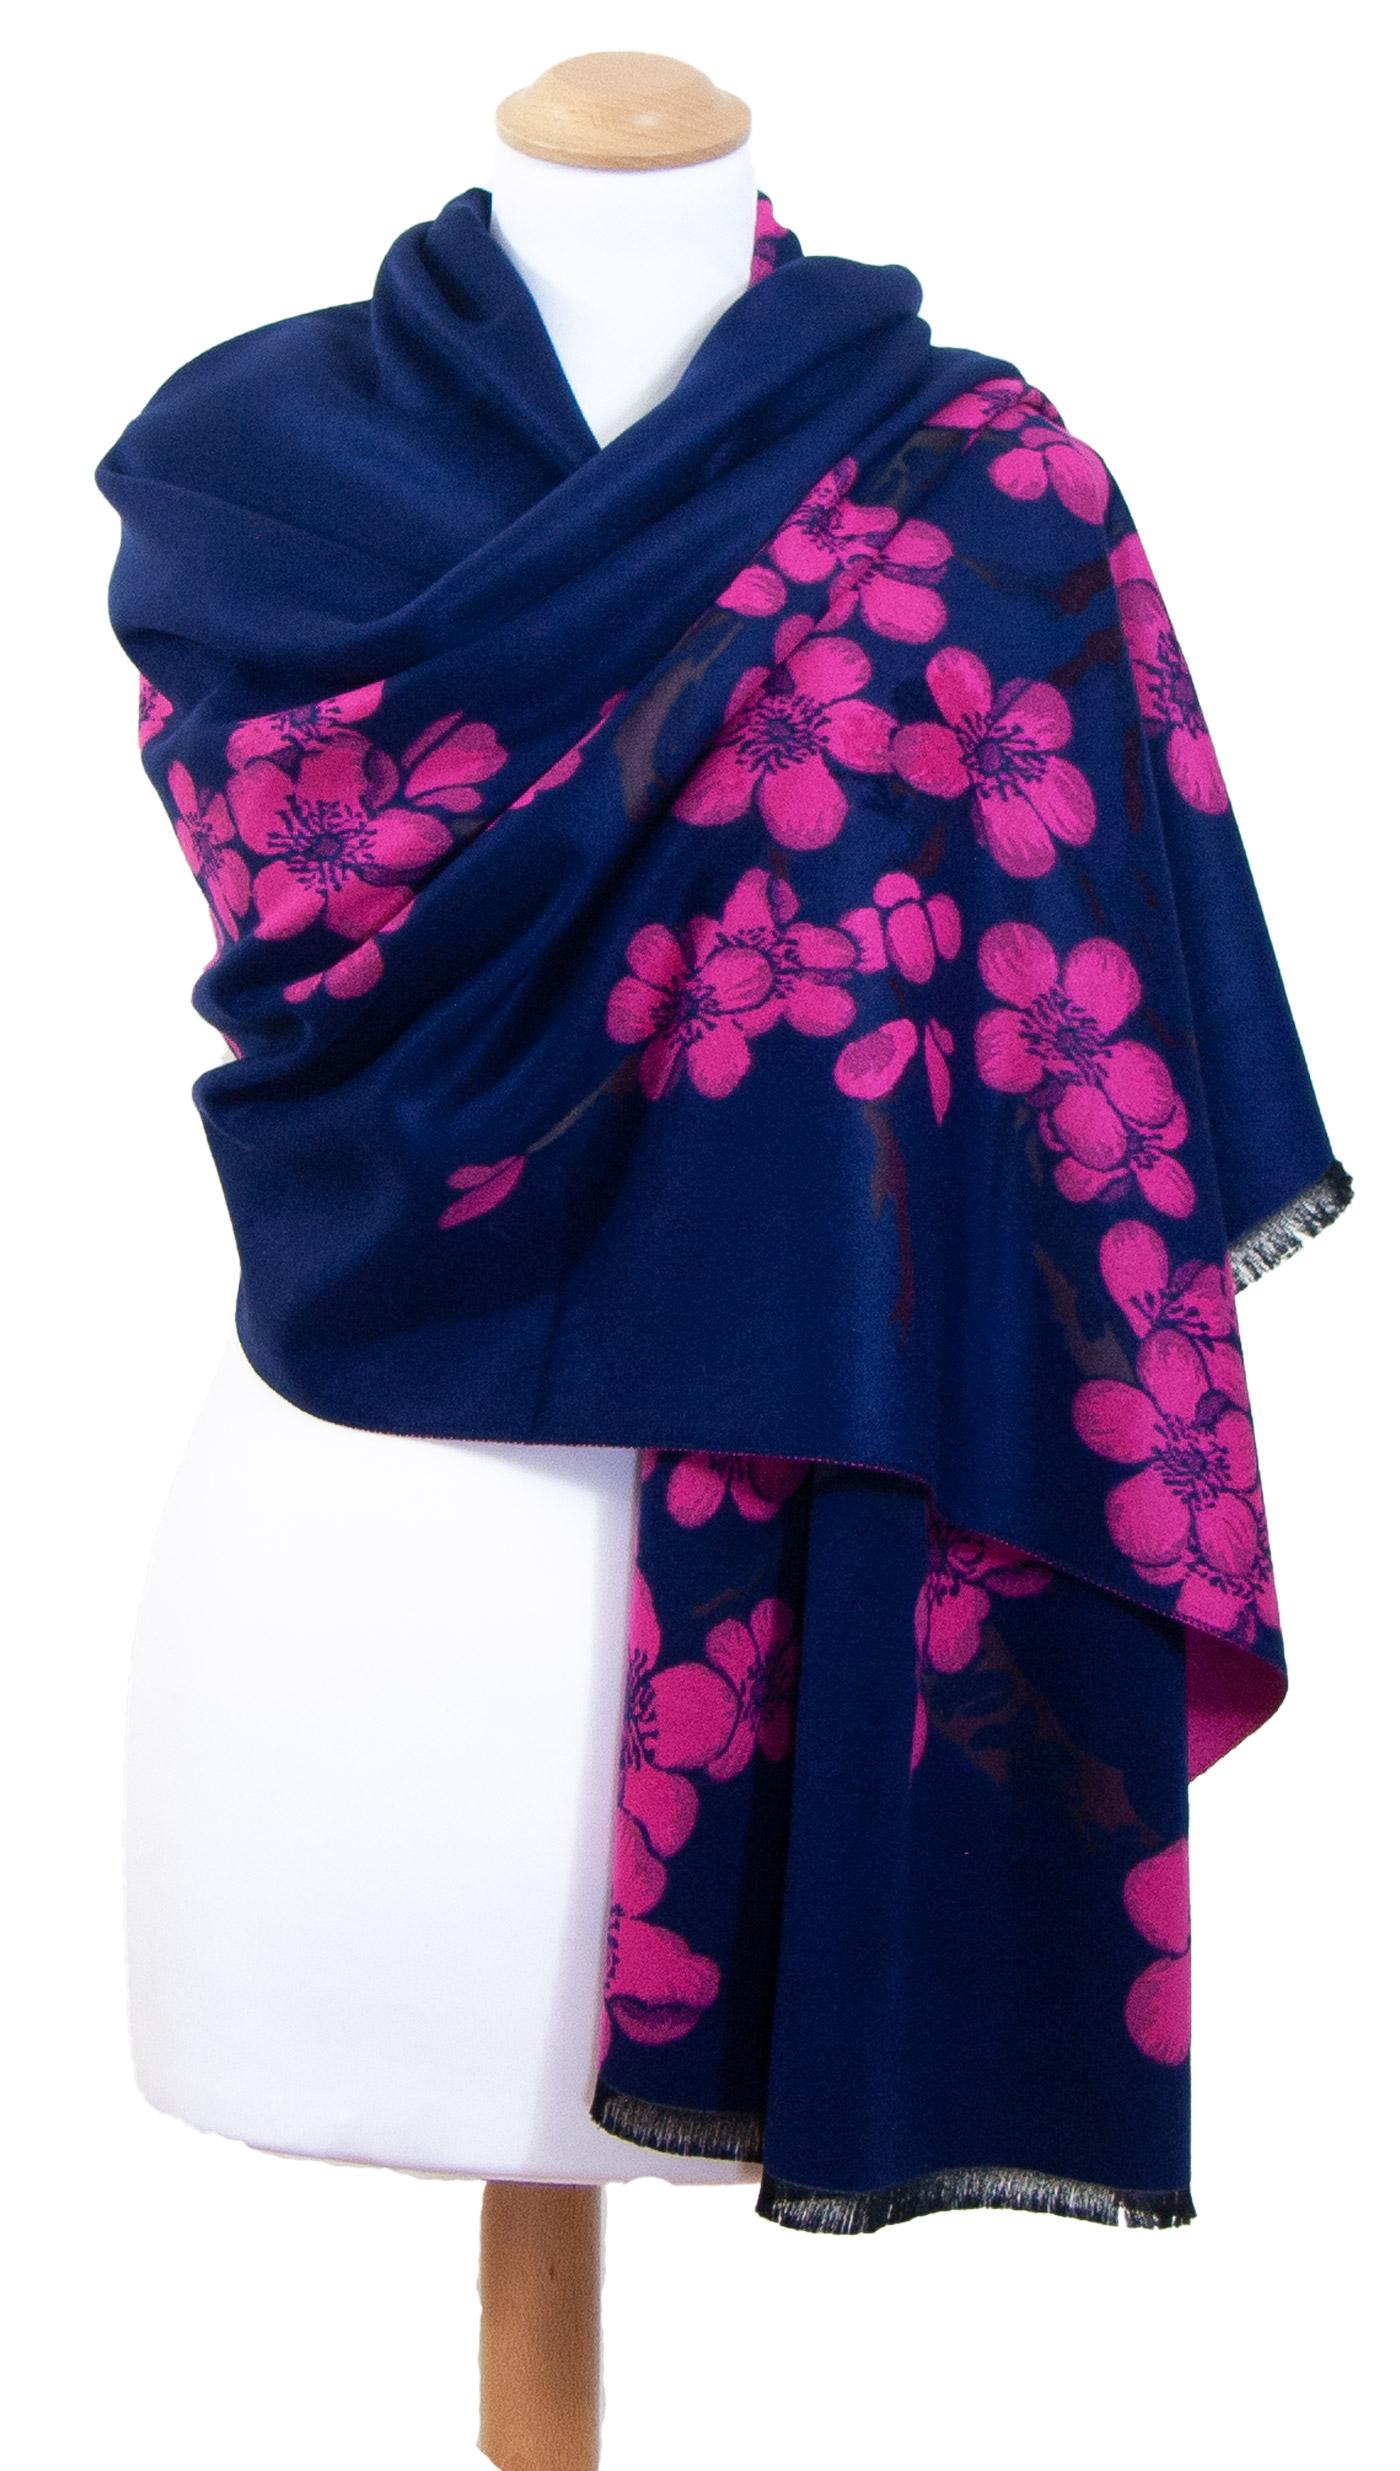 Châle bleu marine rose fleurs de cerisiers